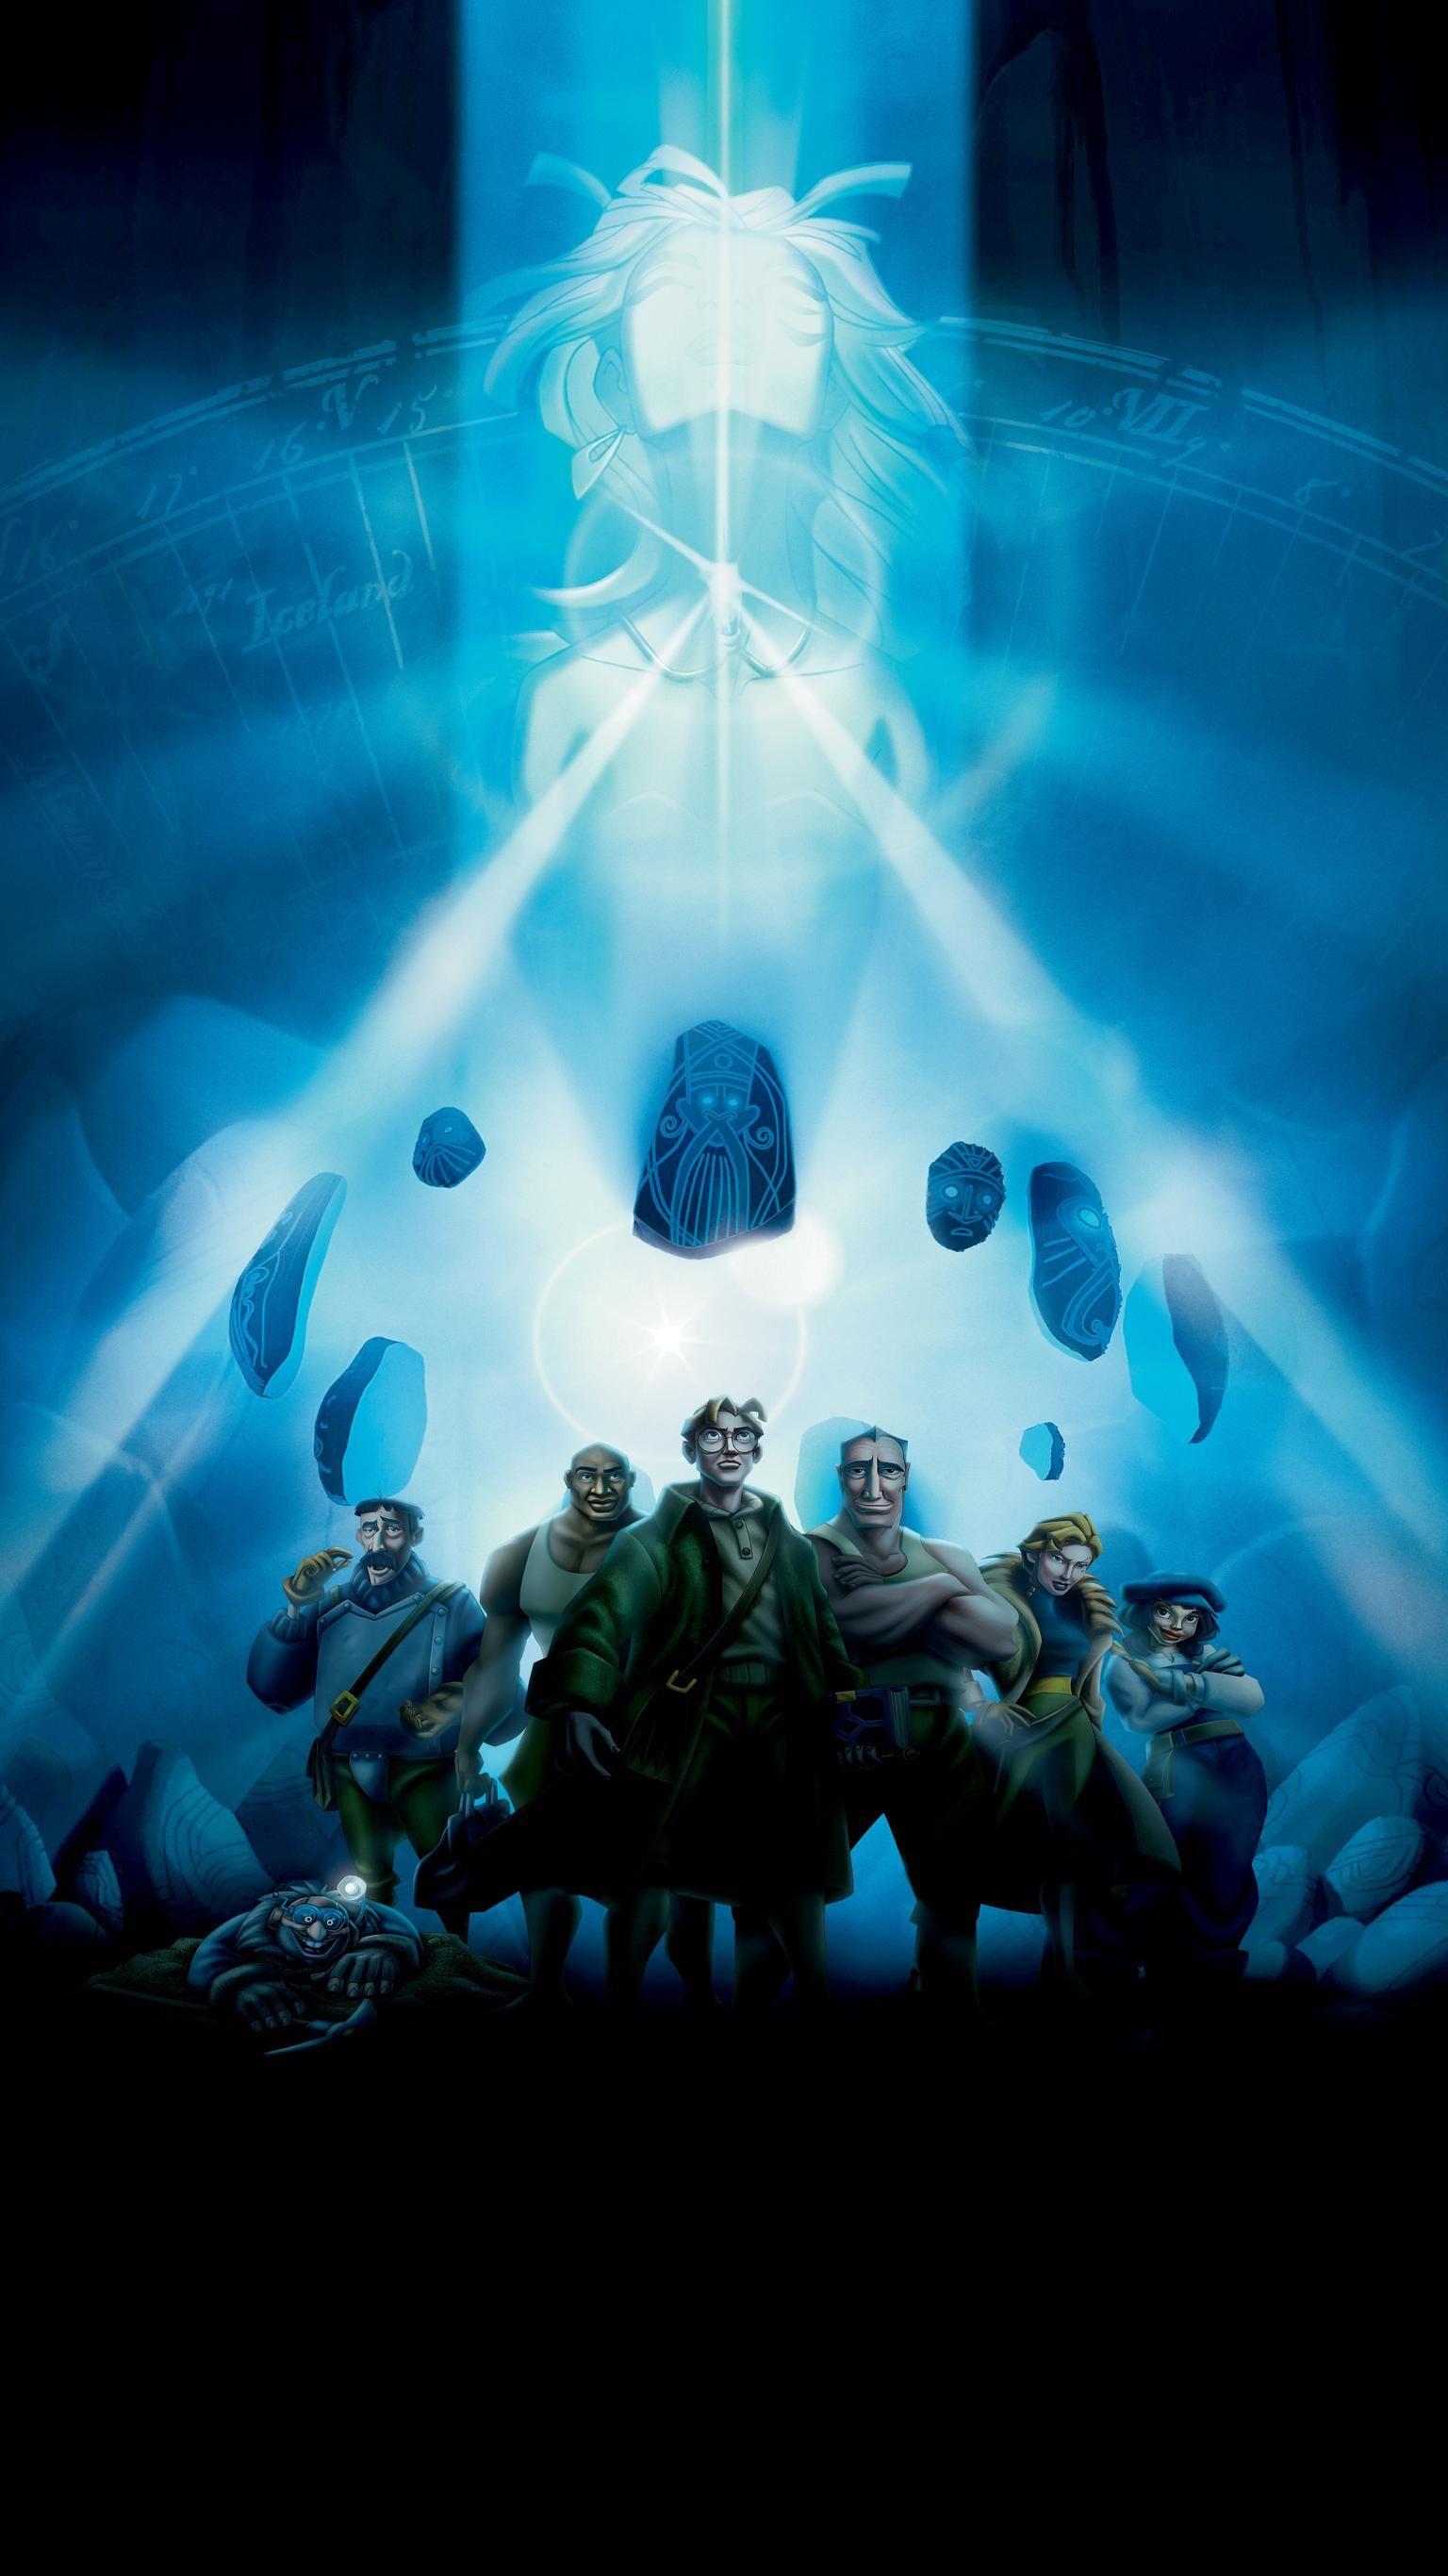 Atlantis The Lost Empire 2001 Phone Wallpaper Moviemania Atlantis The Lost Empire Disney Wallpaper Classic Disney Movies